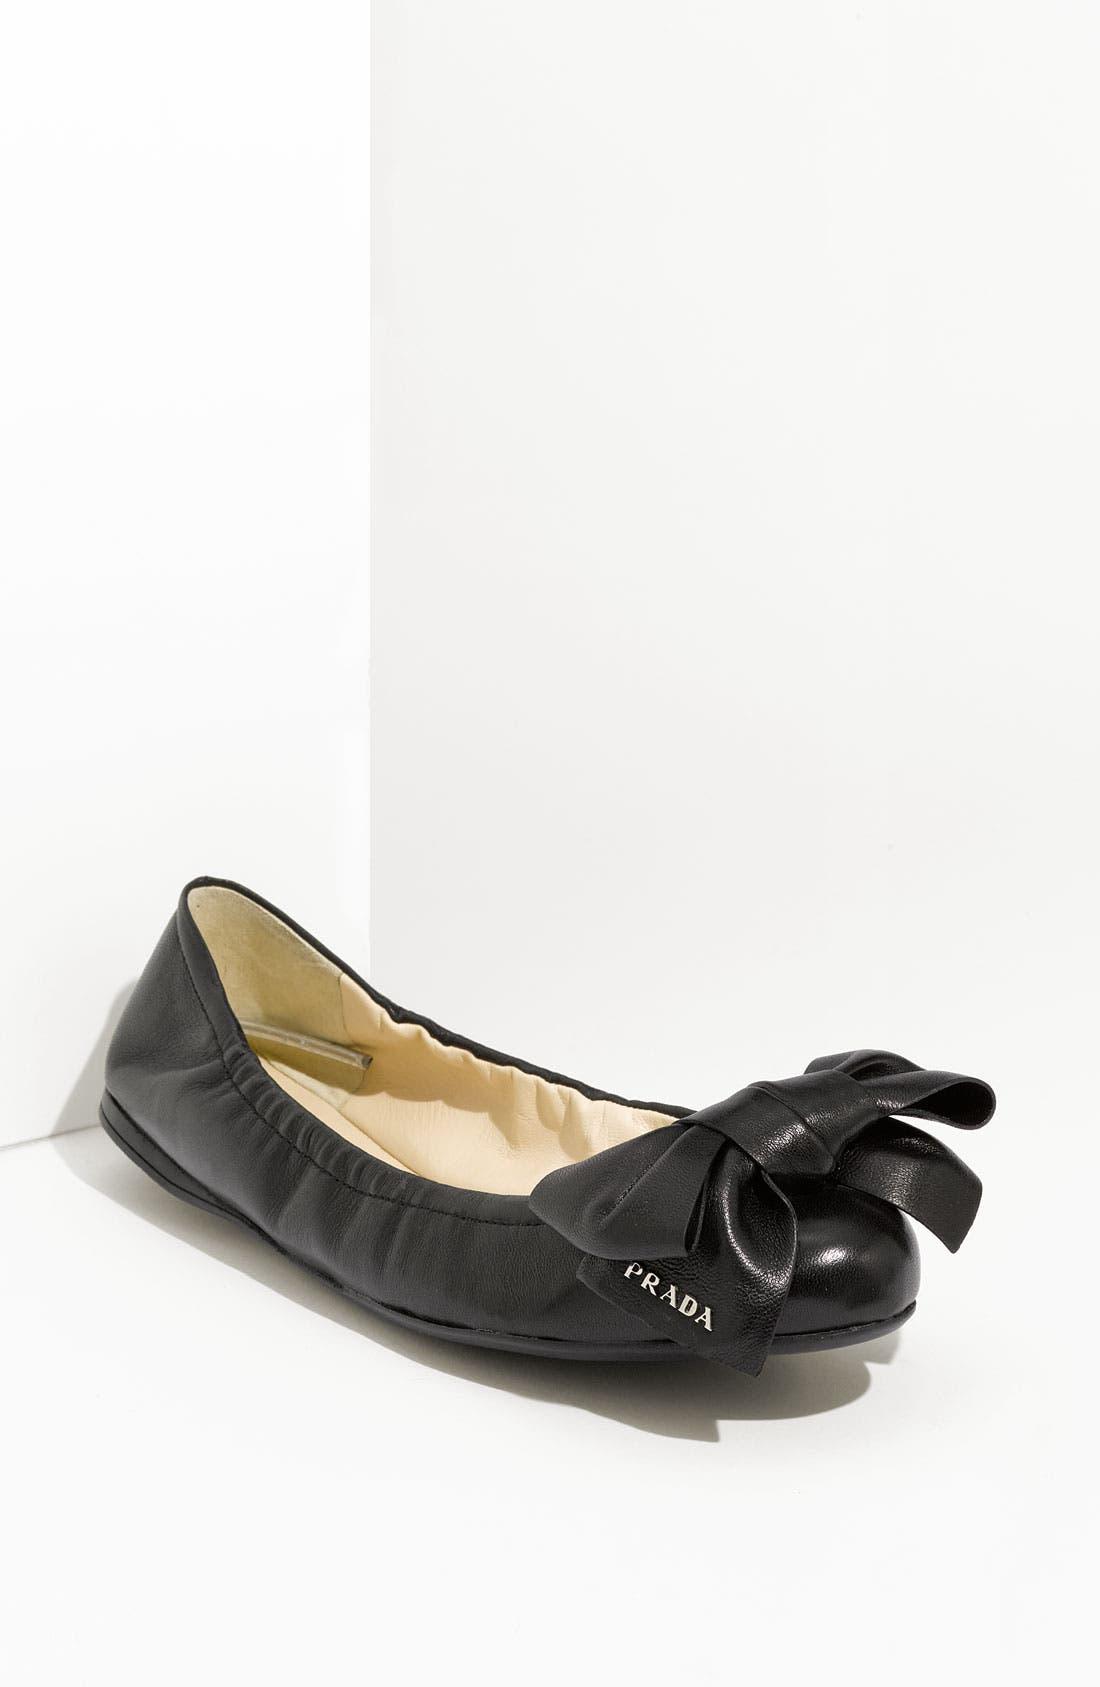 Main Image - Prada Bow Ballerina Flat